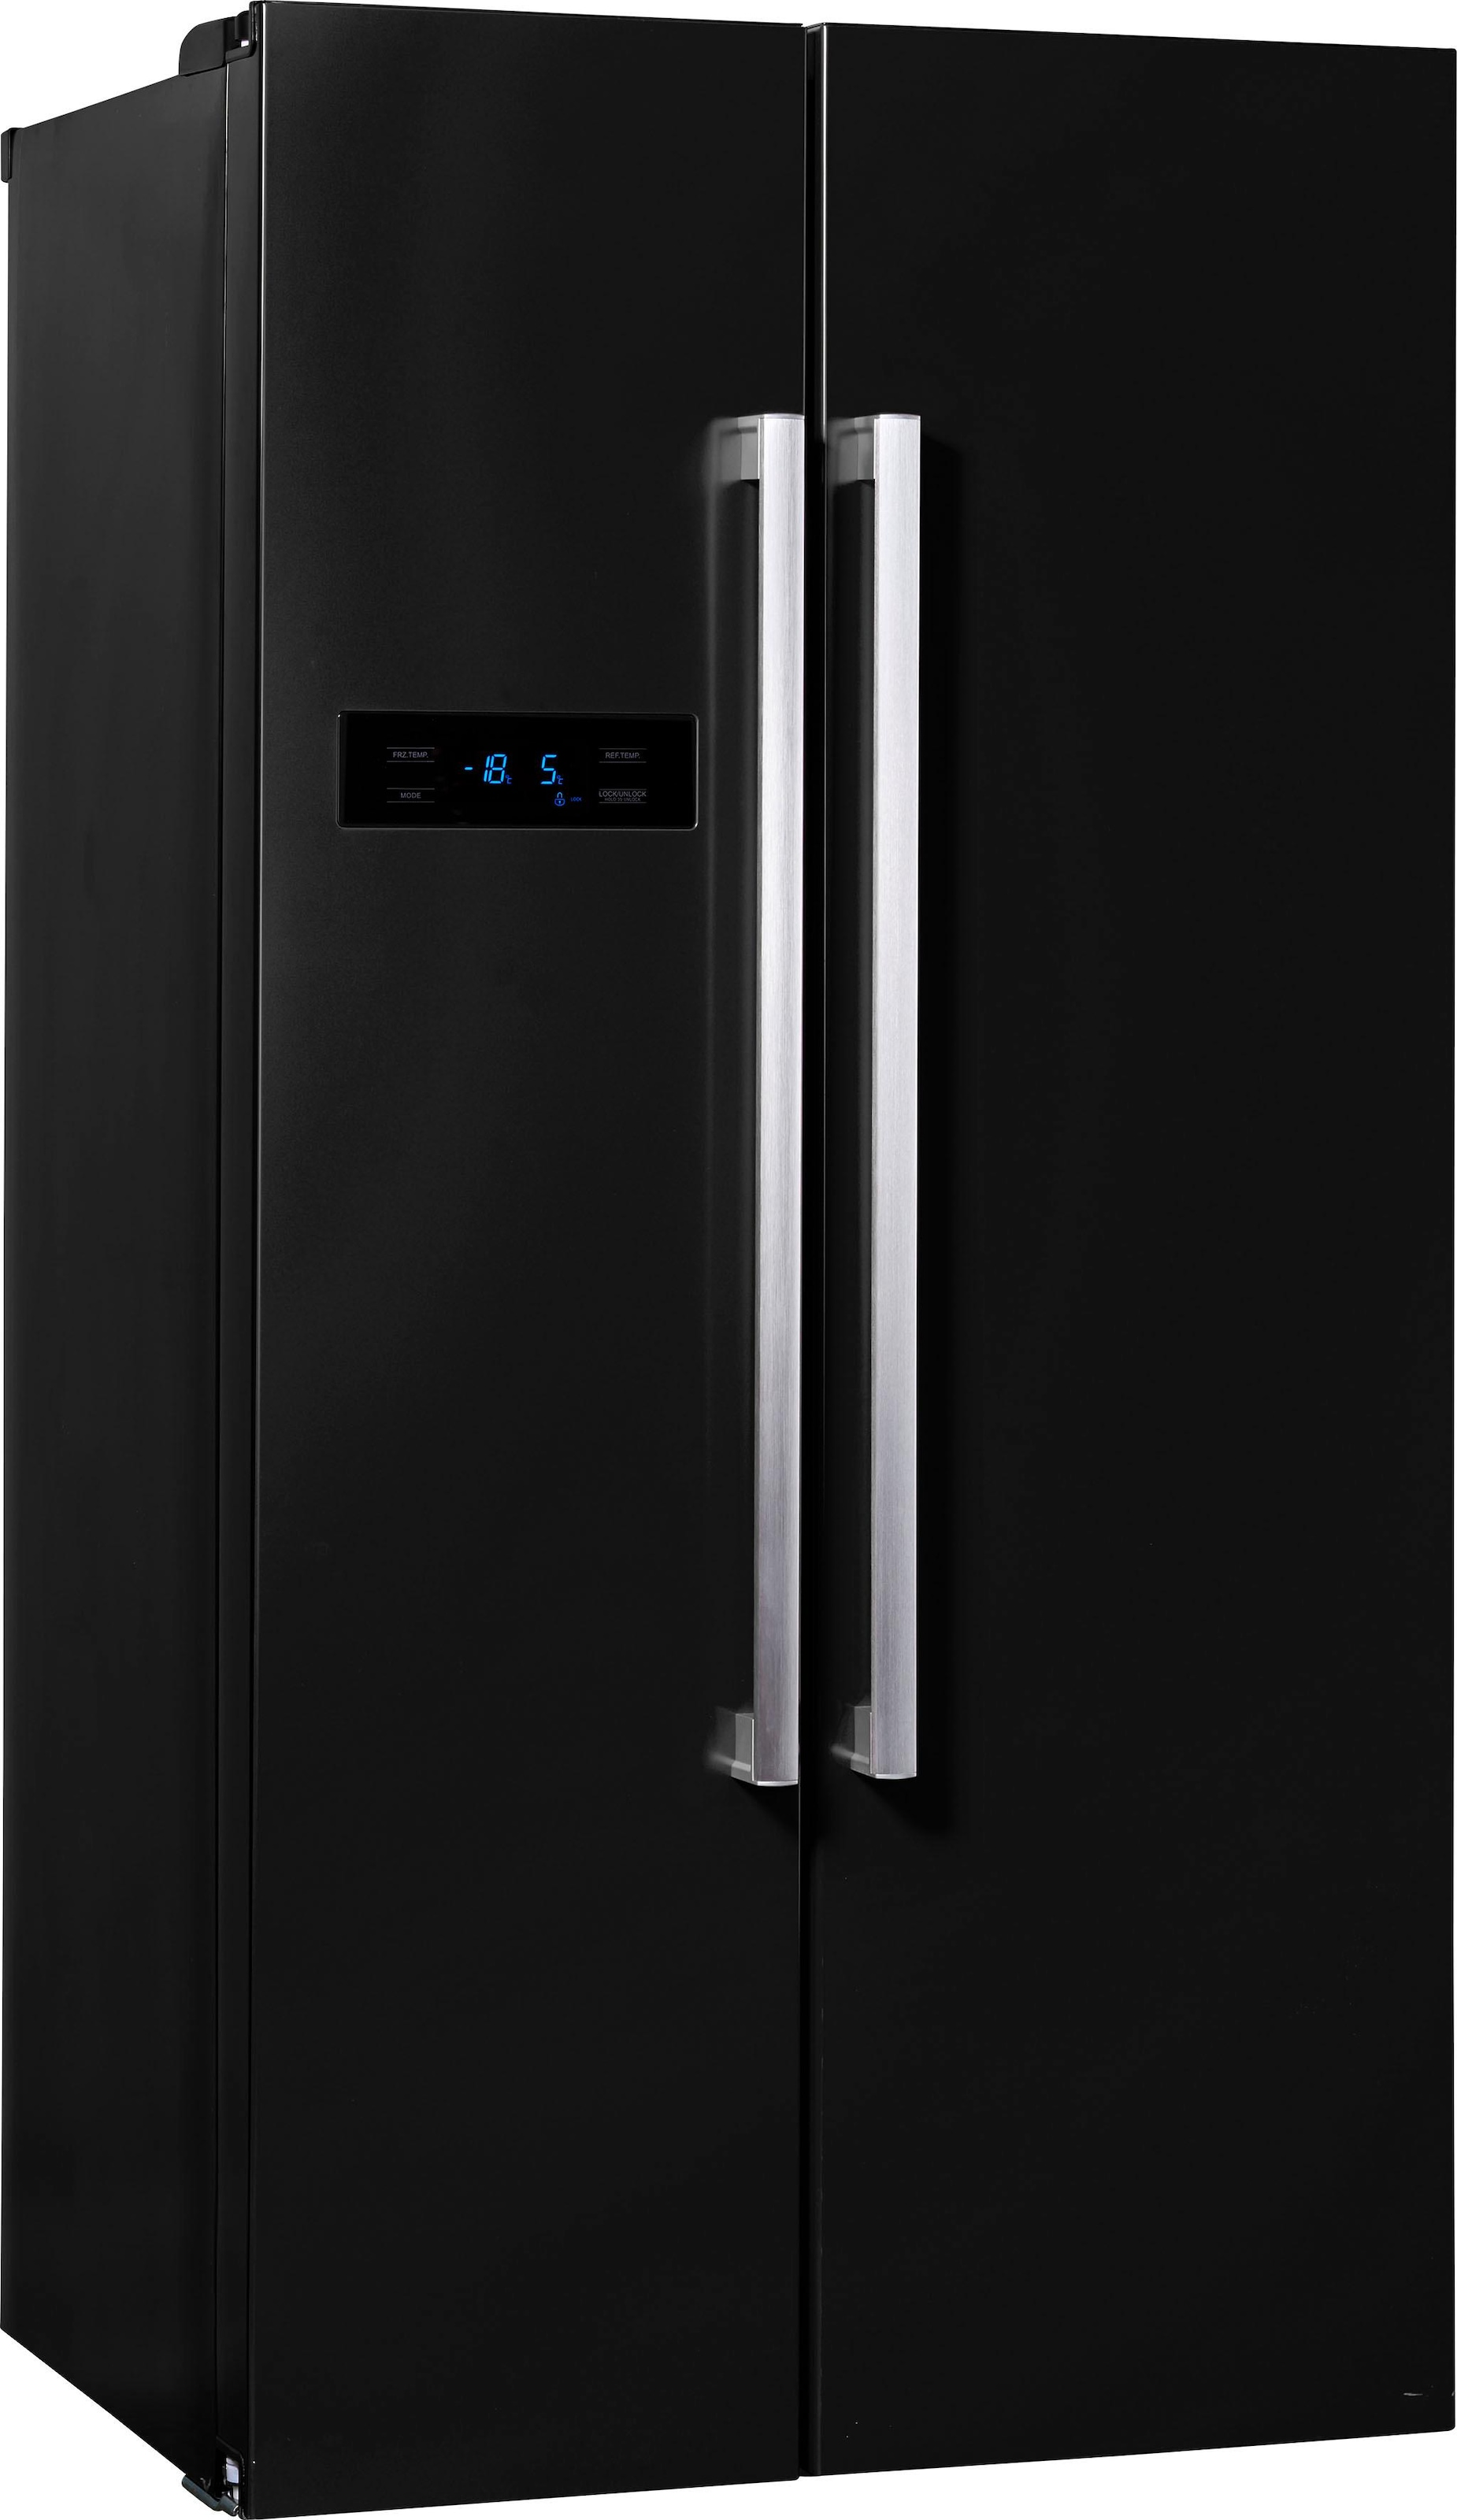 Gorenje Kühlschrank Vw Preis : Retro kühlschrank test ▷ testberichte